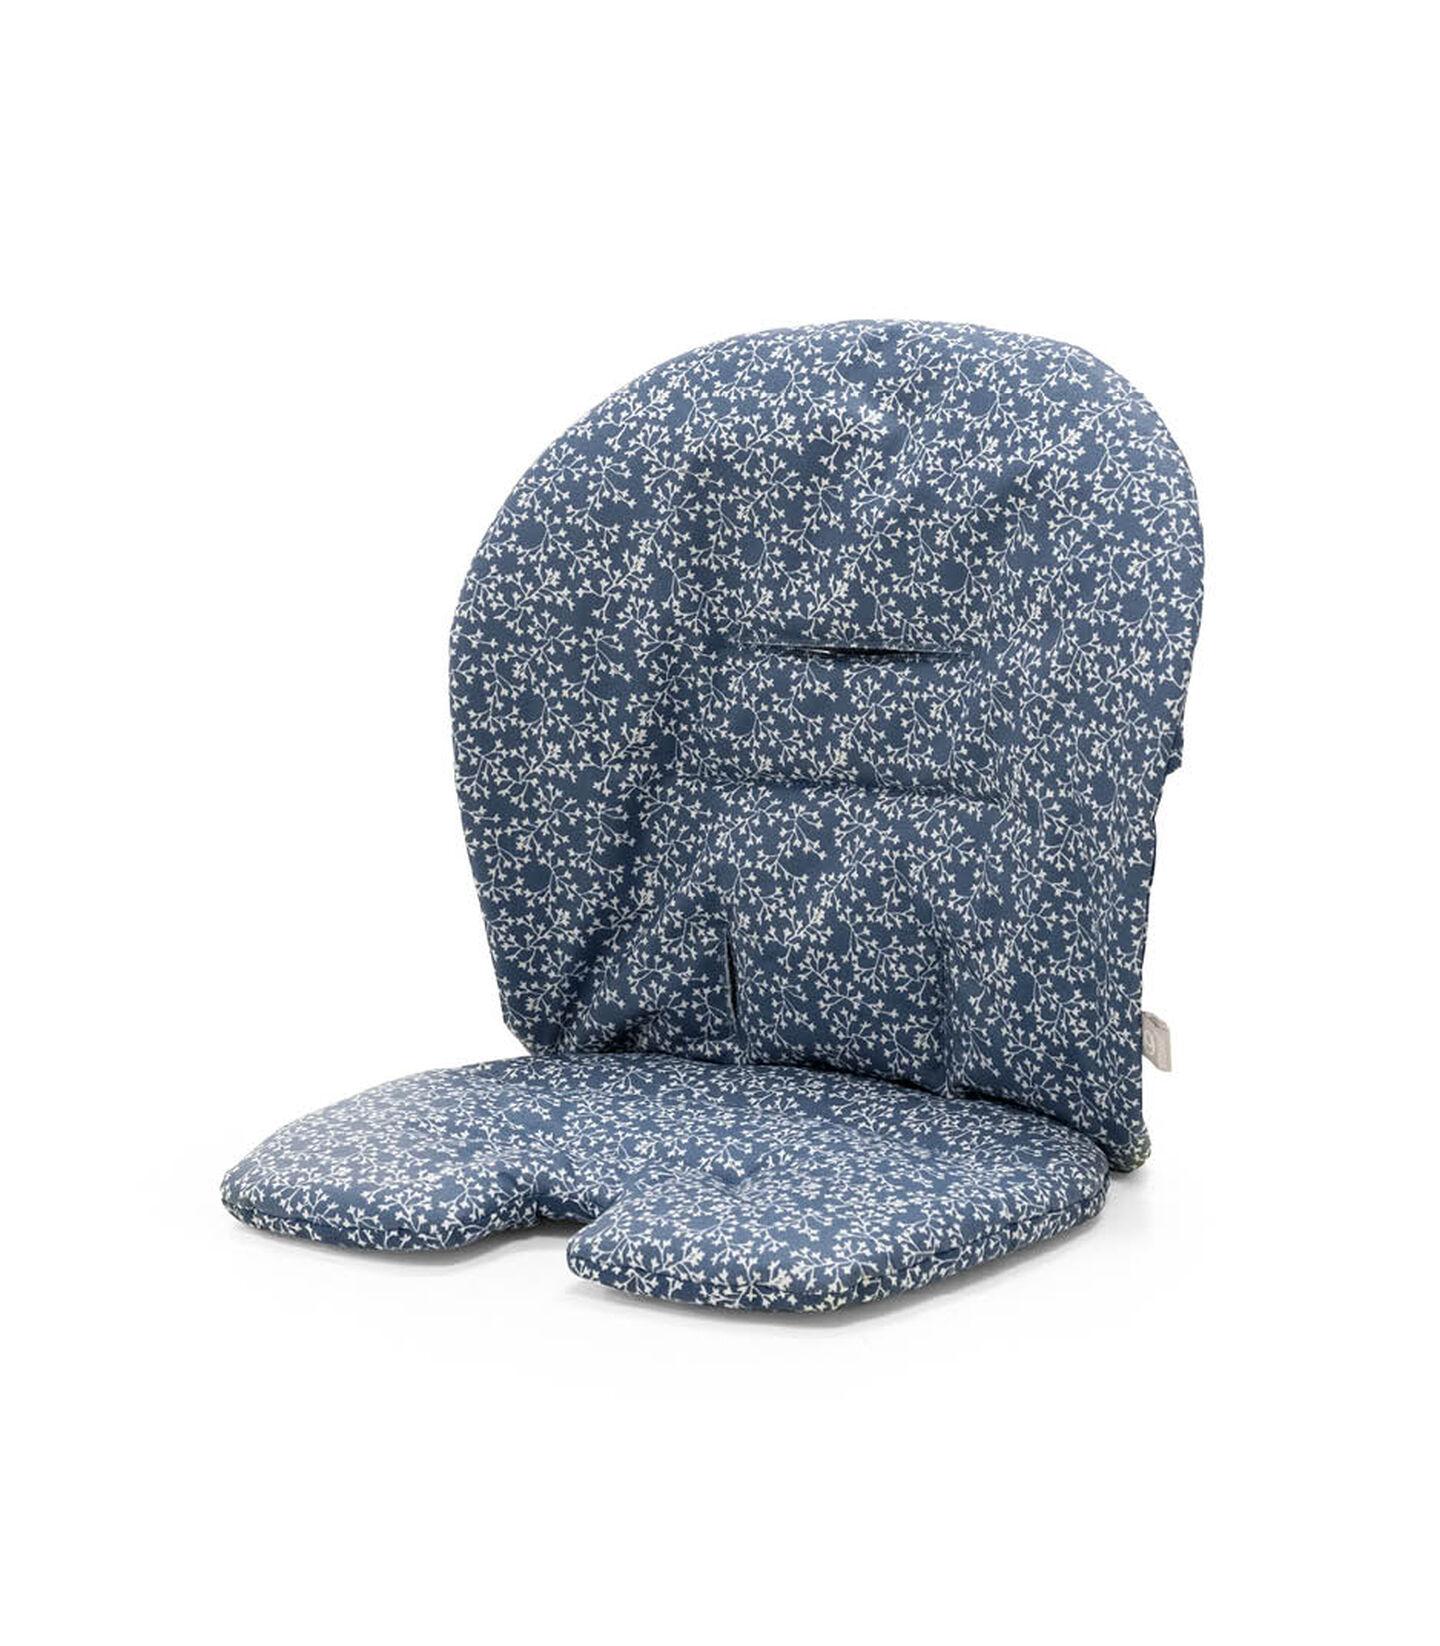 Stokke® Steps™ Accessories. Baby Set Cushion. Flower Garden. view 1